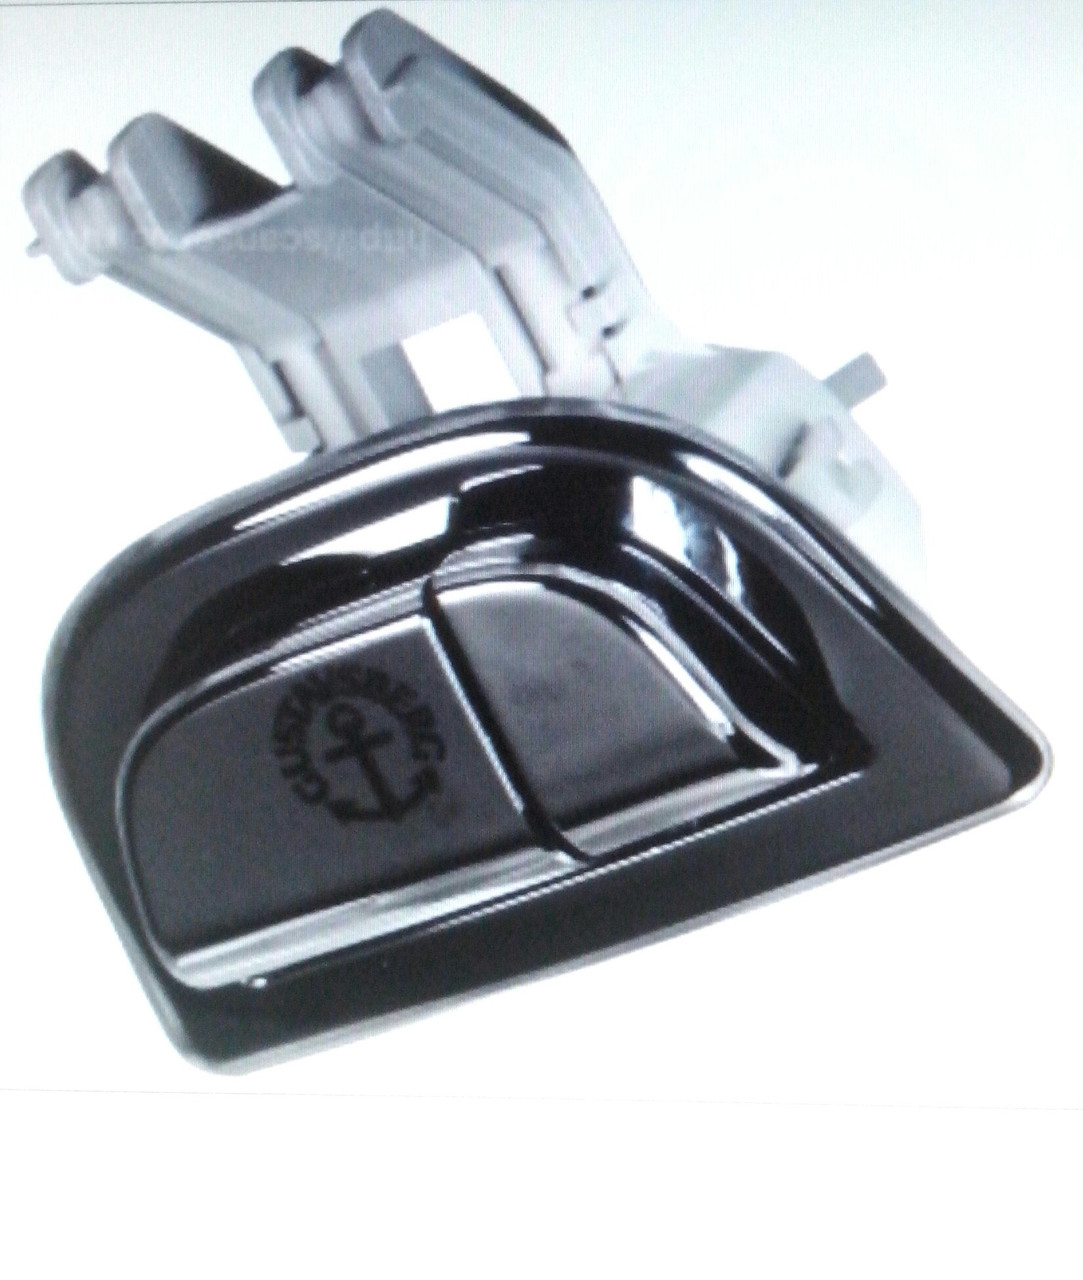 Кнопка механизма двойного слива GUSTAVSBERG NAUTIC